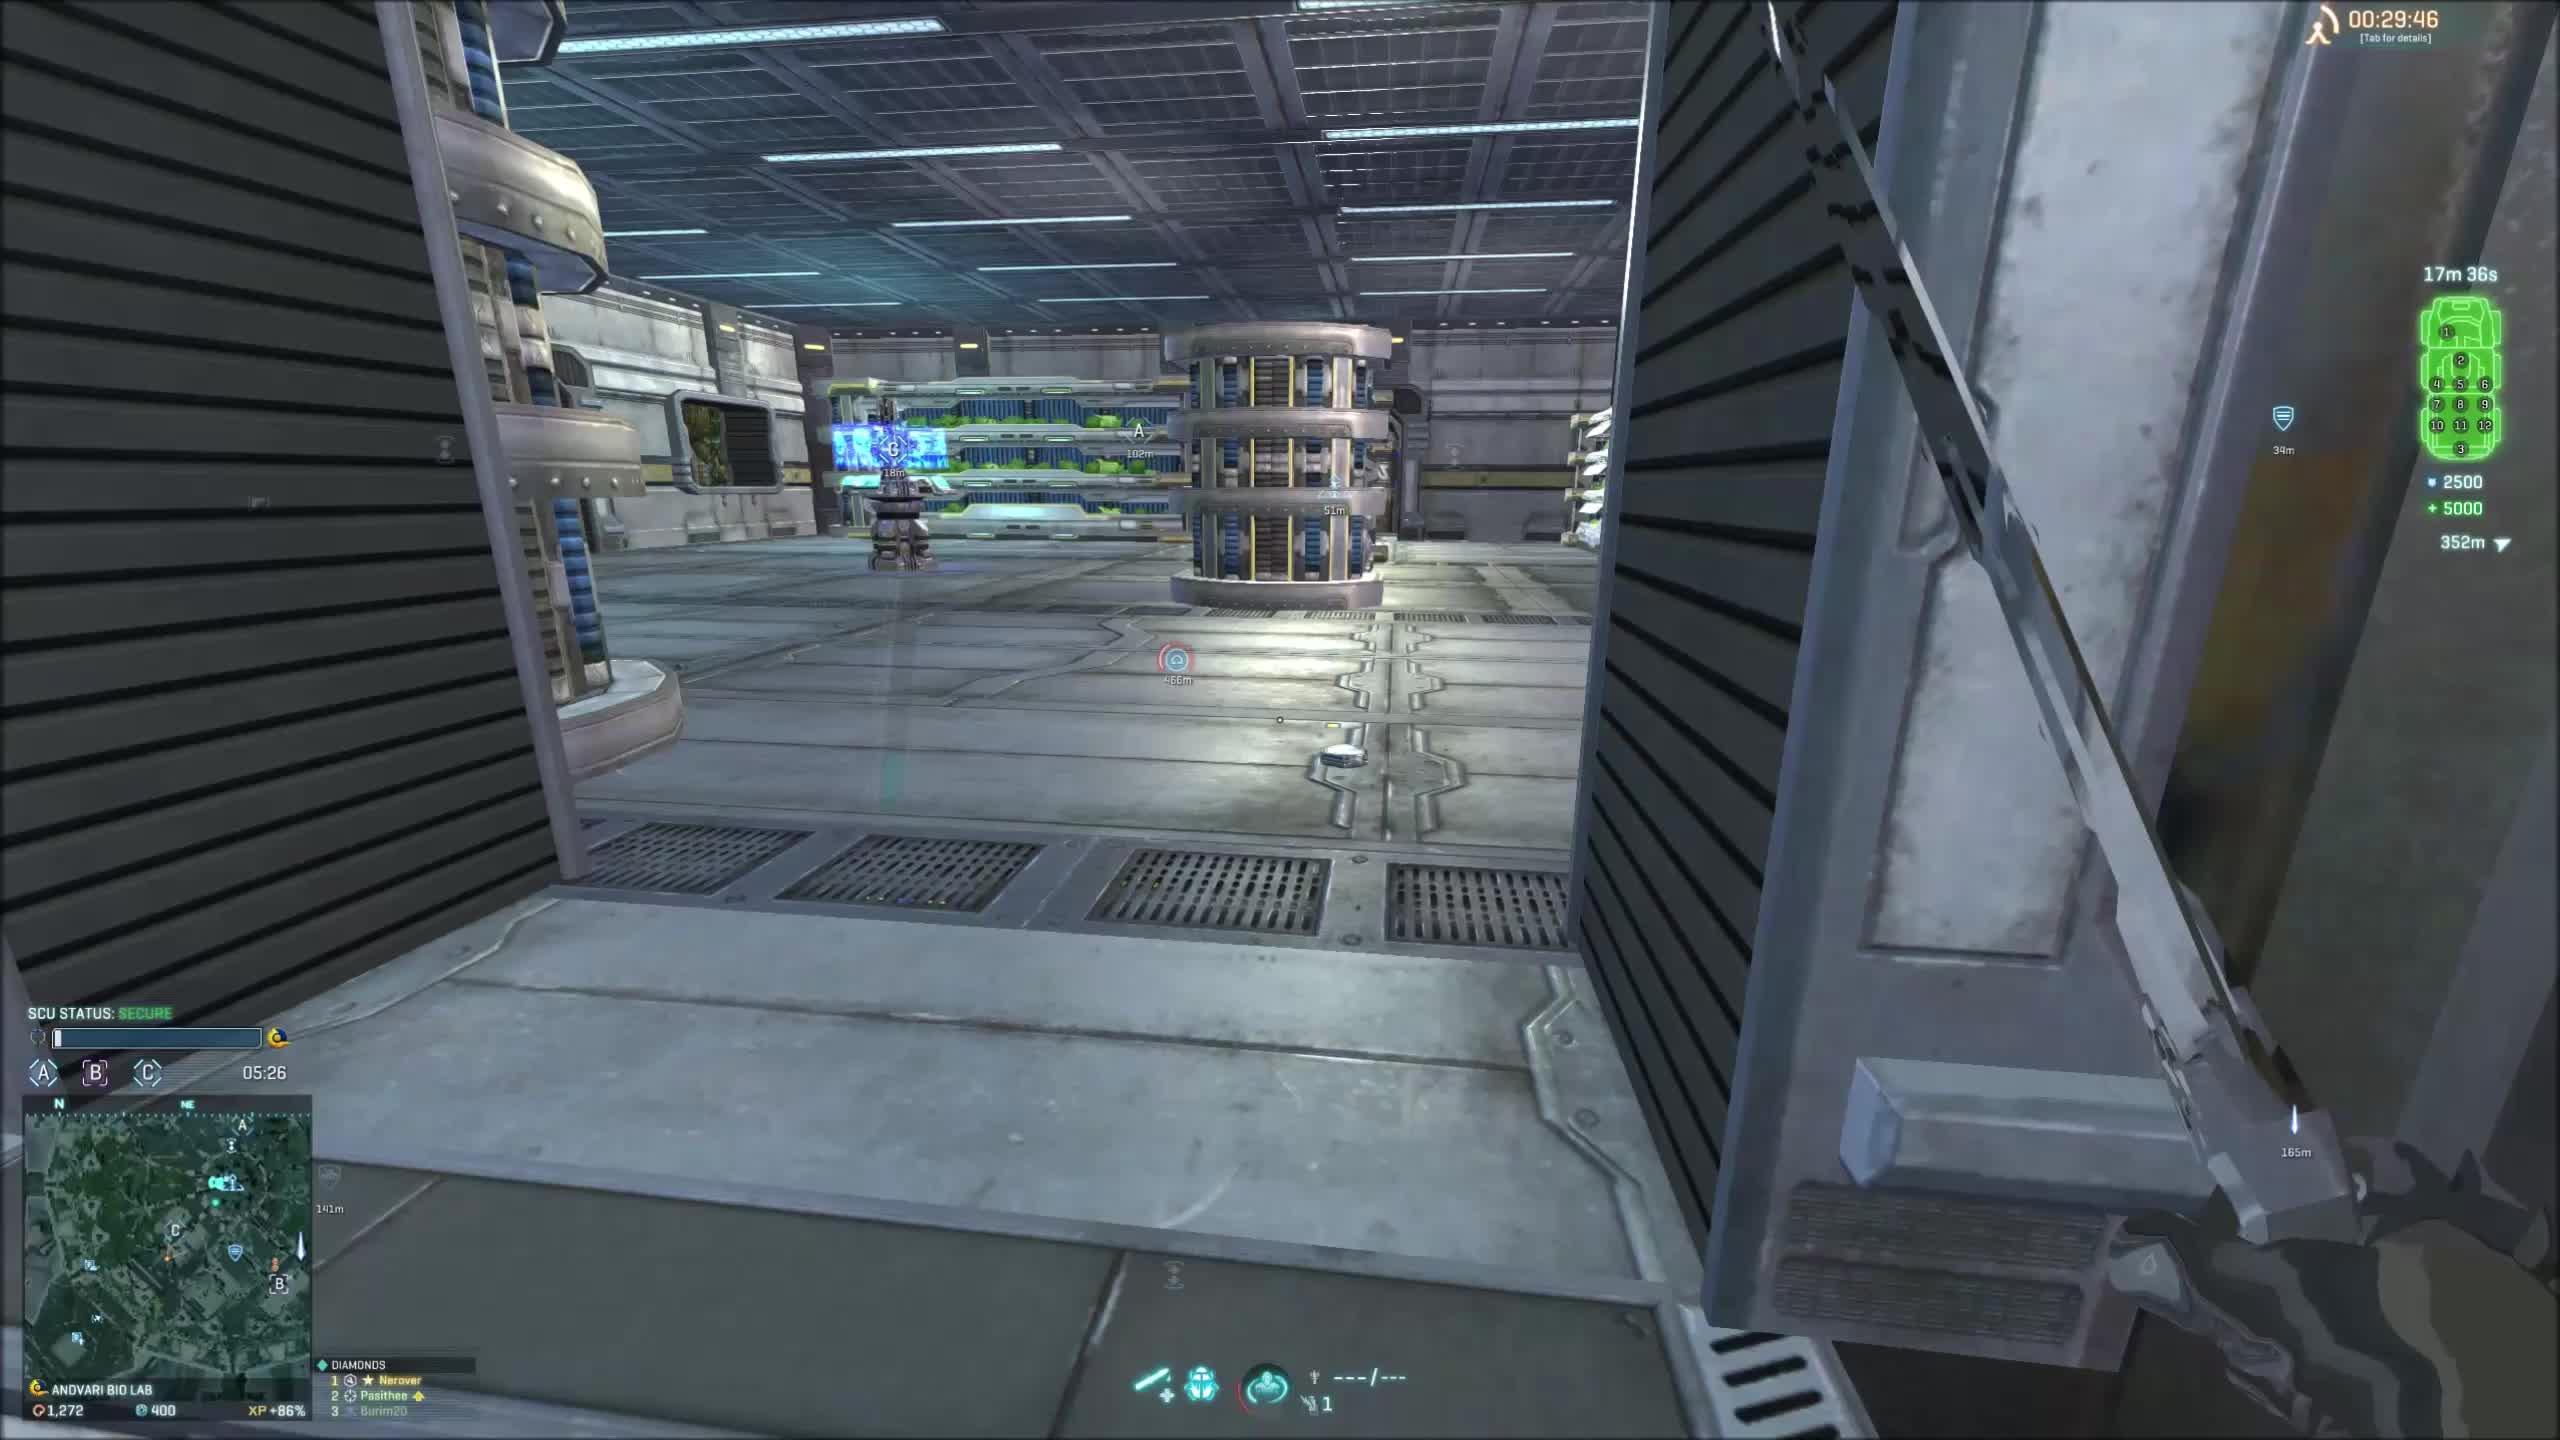 NerfClaymore, PS2, PS:A, Planetside, Planetside 2, Planetside Arena, Planetside2, Wrelpls, Claymore vs. Bouncing Betty GIFs